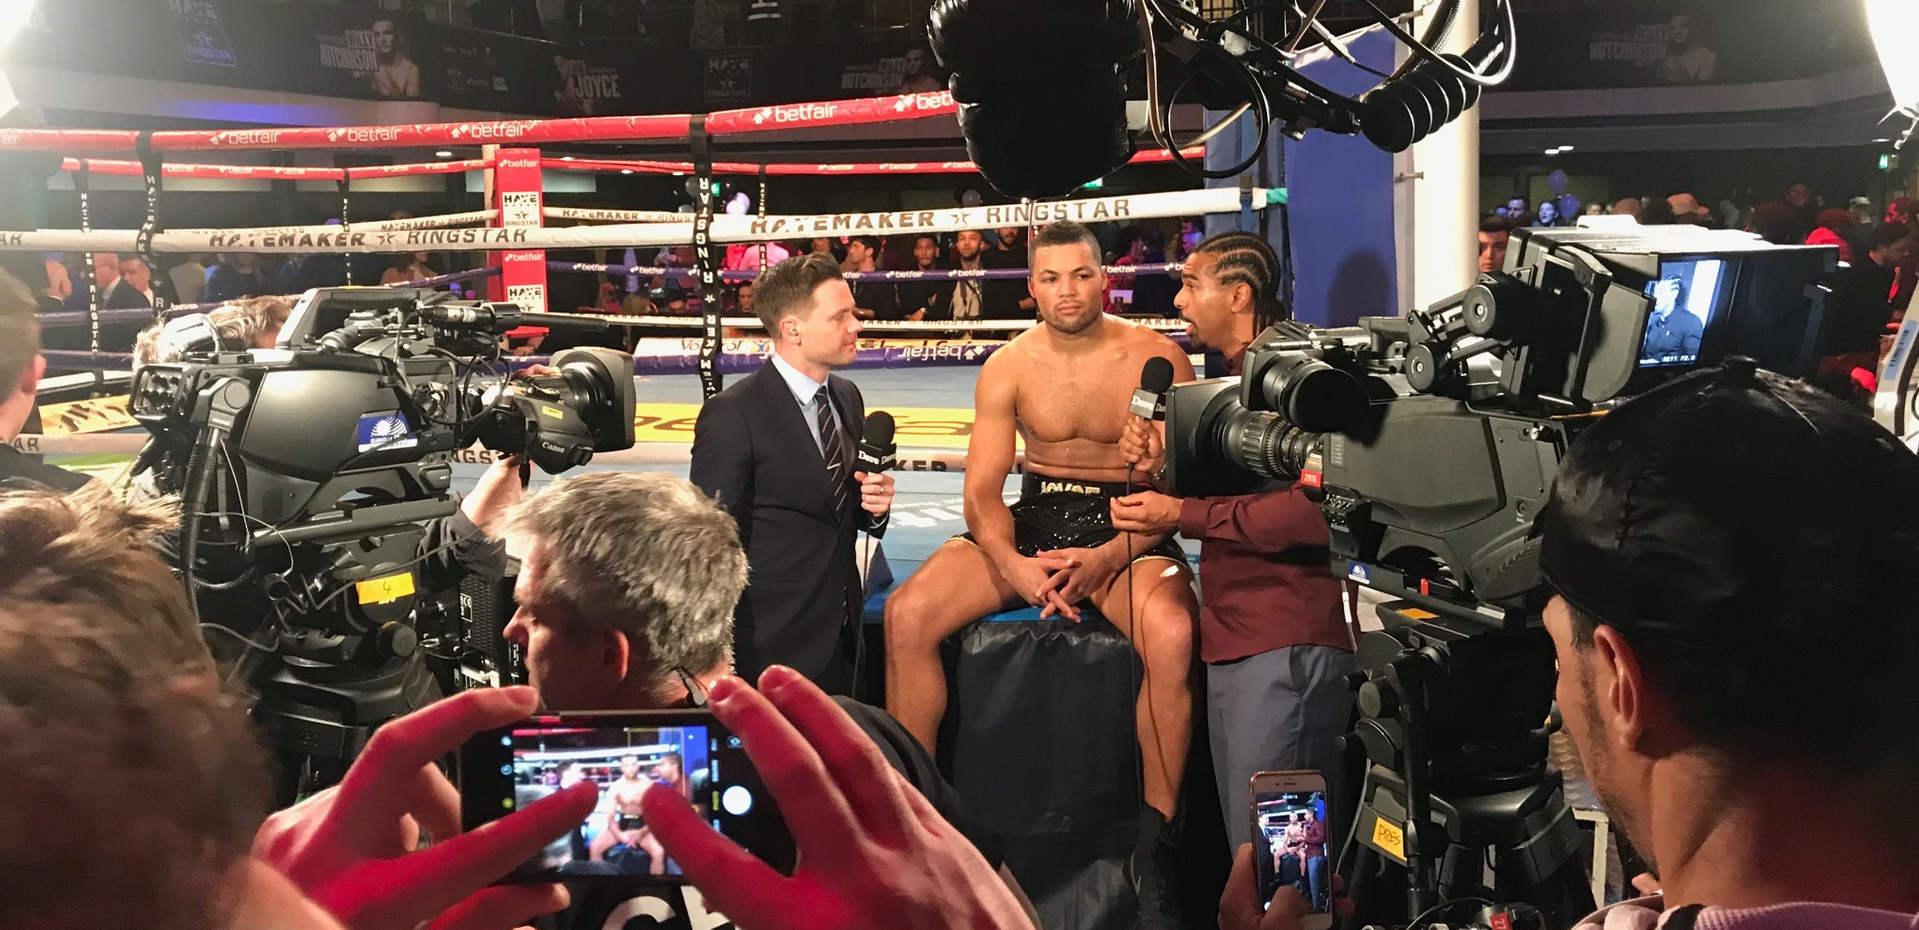 Boxing - York Hall.jpg